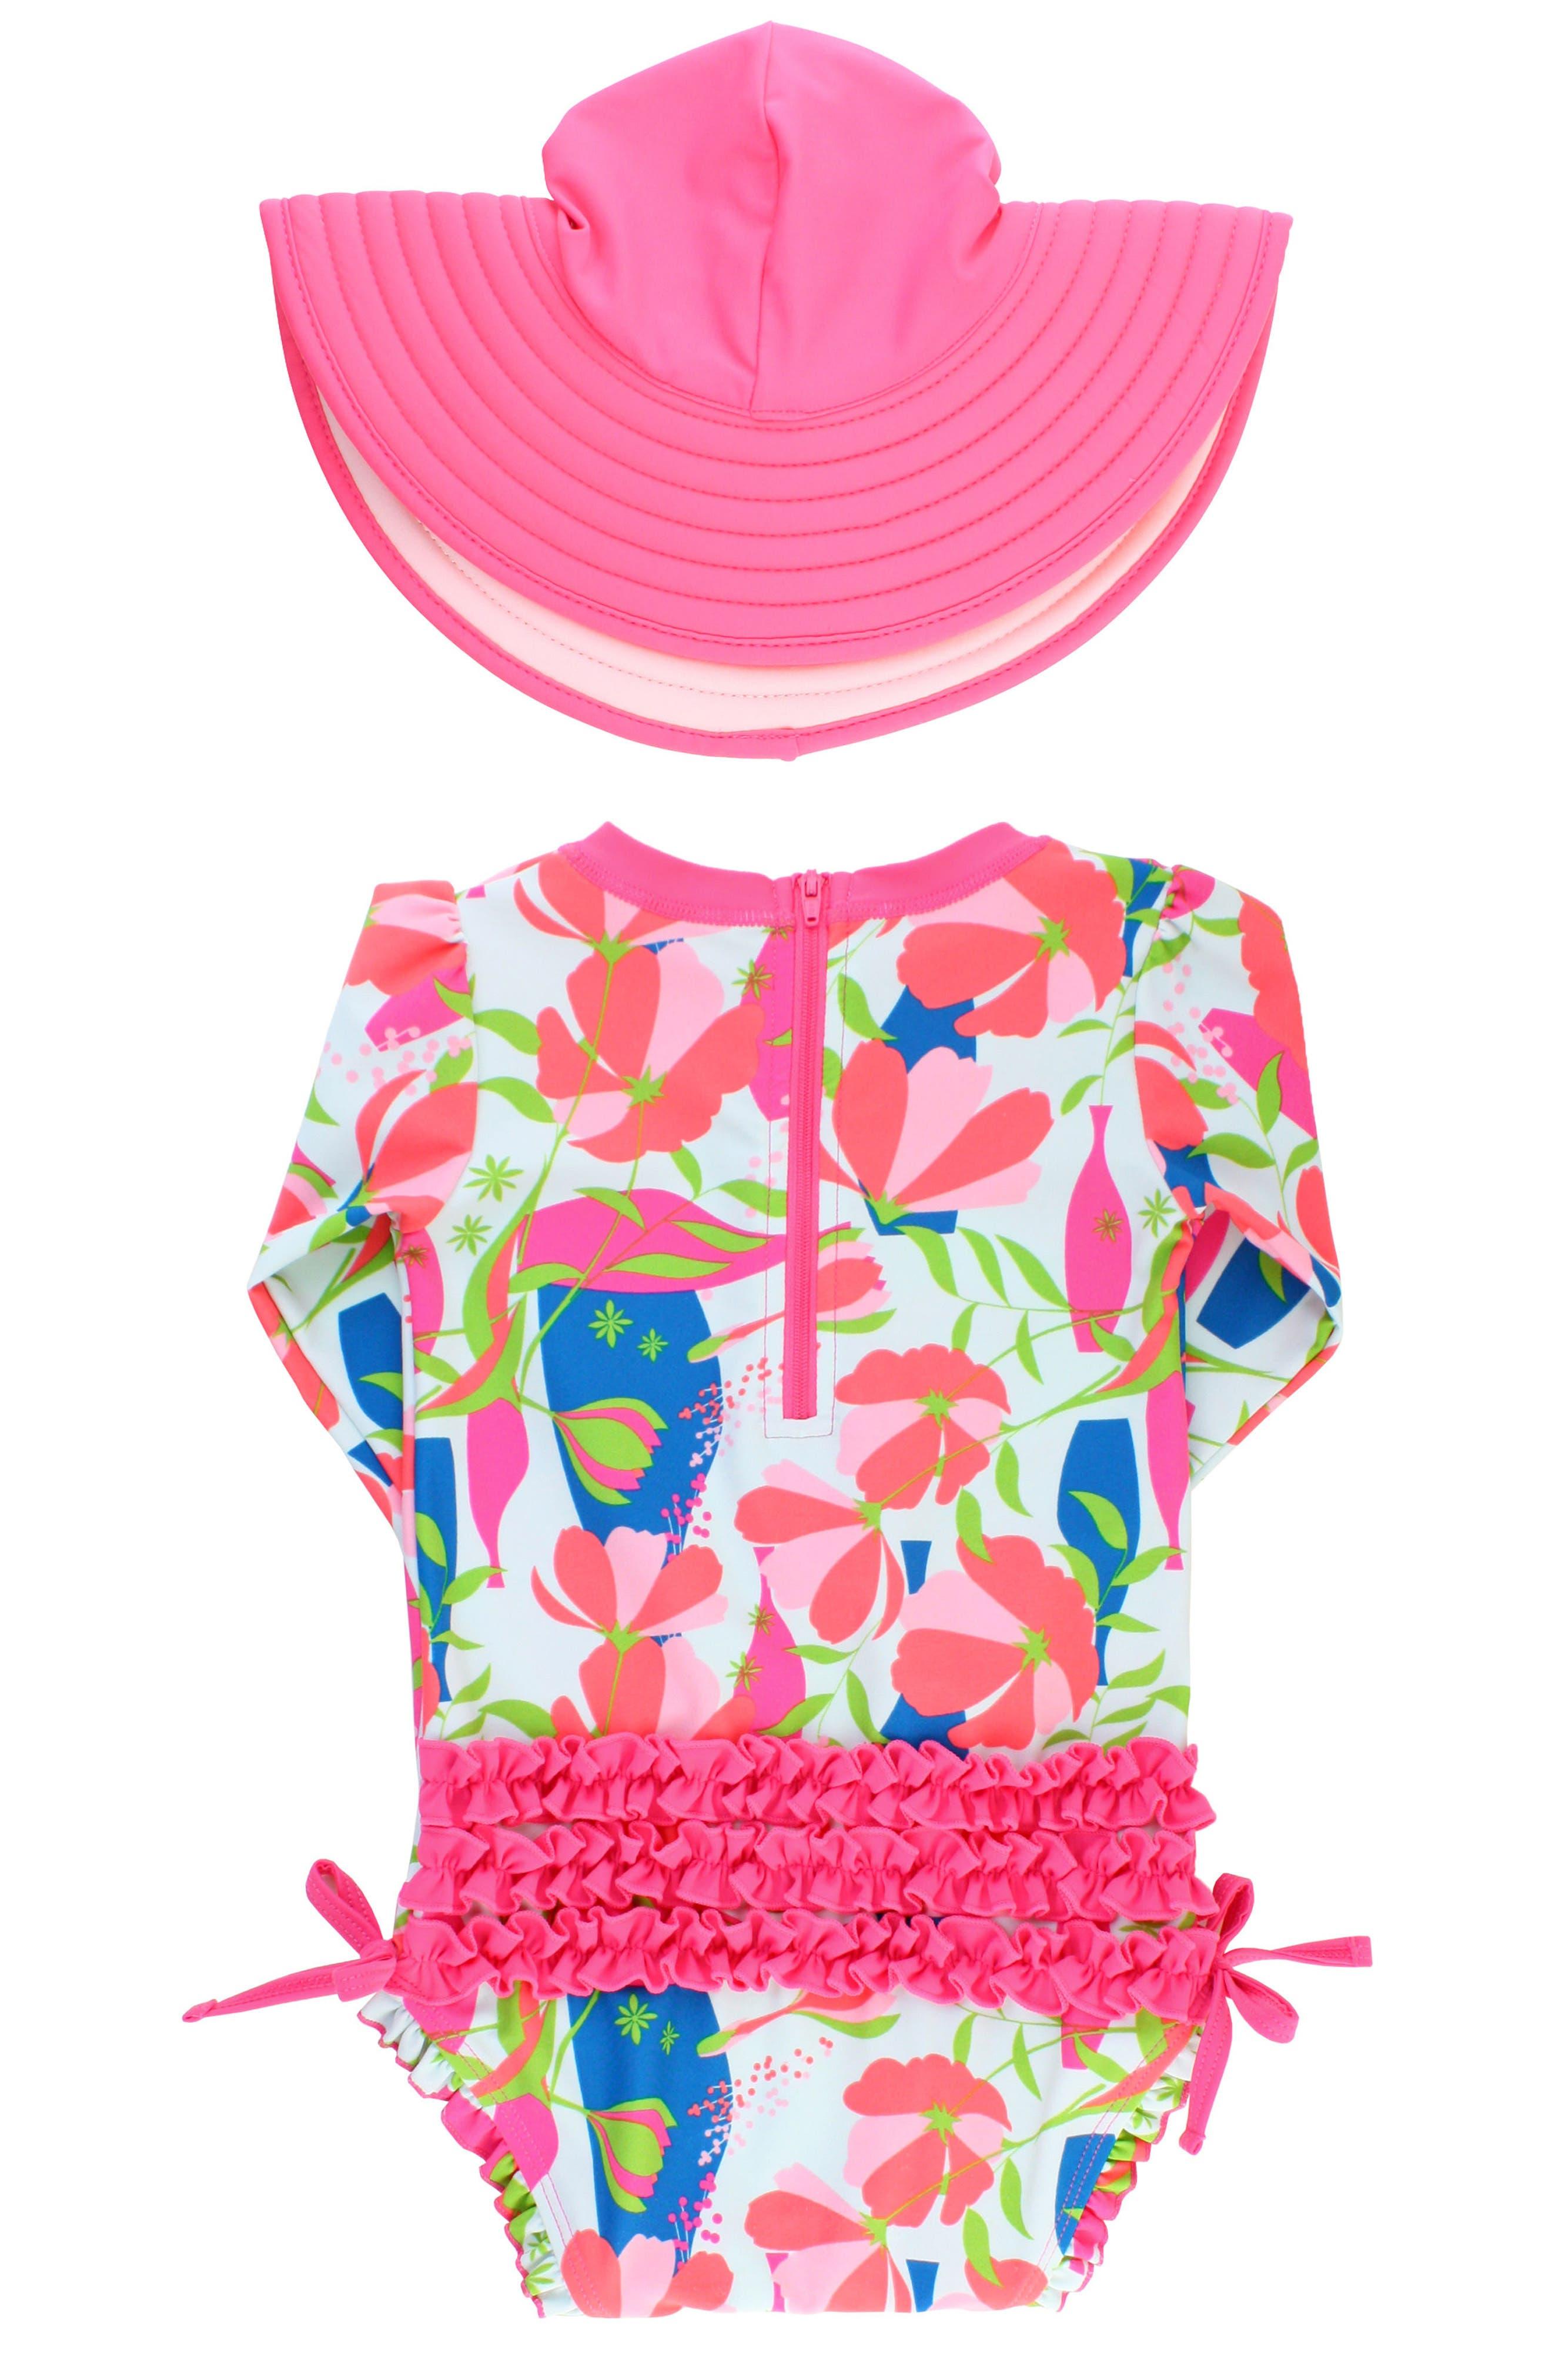 Alternate Image 2  - Ruffle Butts Jeweled Stems One-Piece Rashguard Swimsuit & Sun Hat Set (Baby Girls)